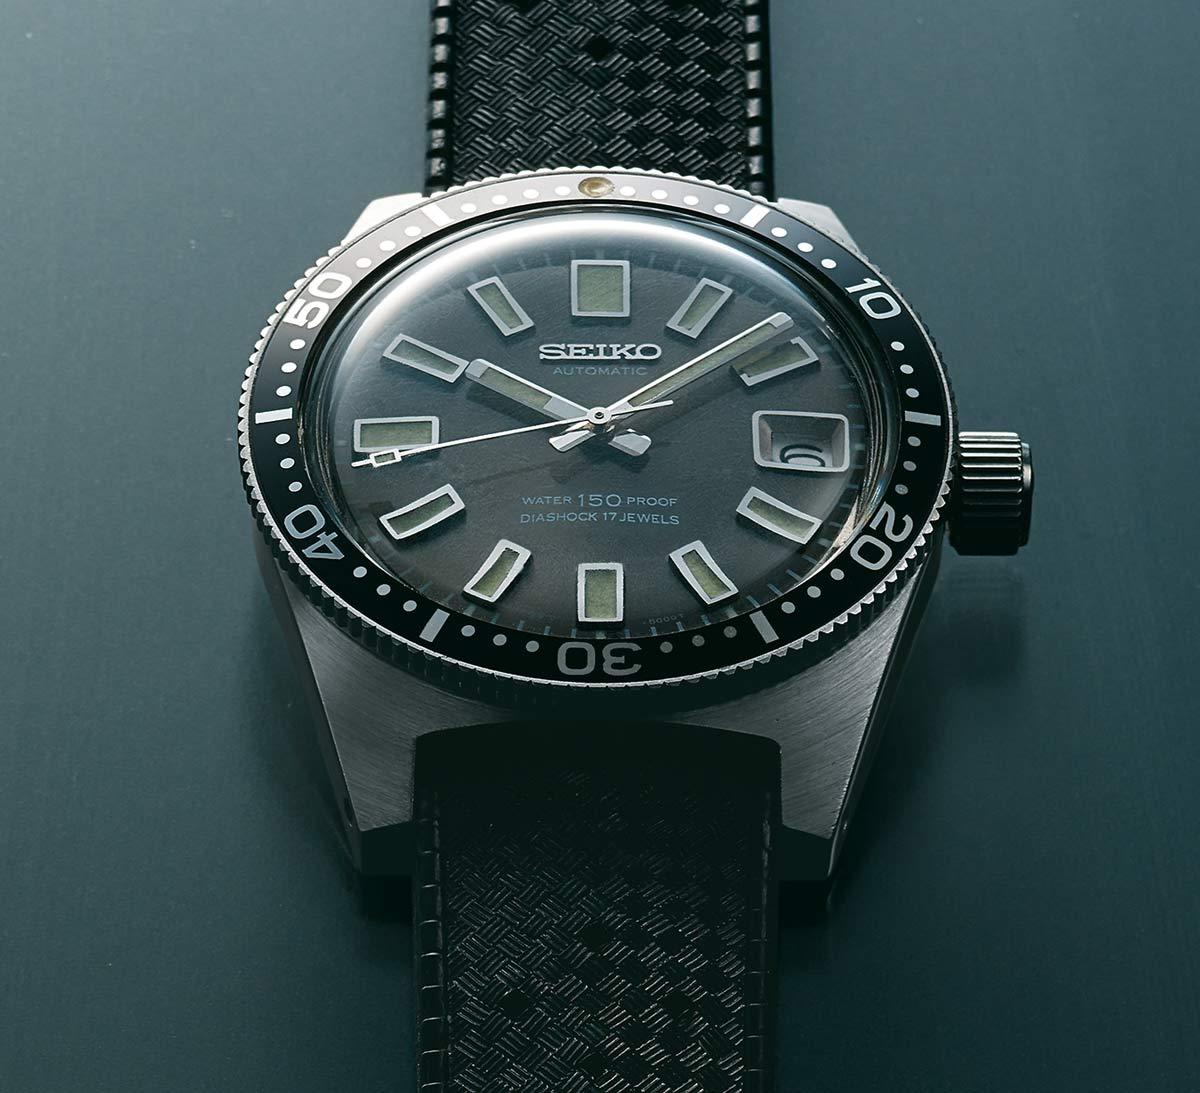 Seiko Prospex Diver Ref Sla017 Time And Watches